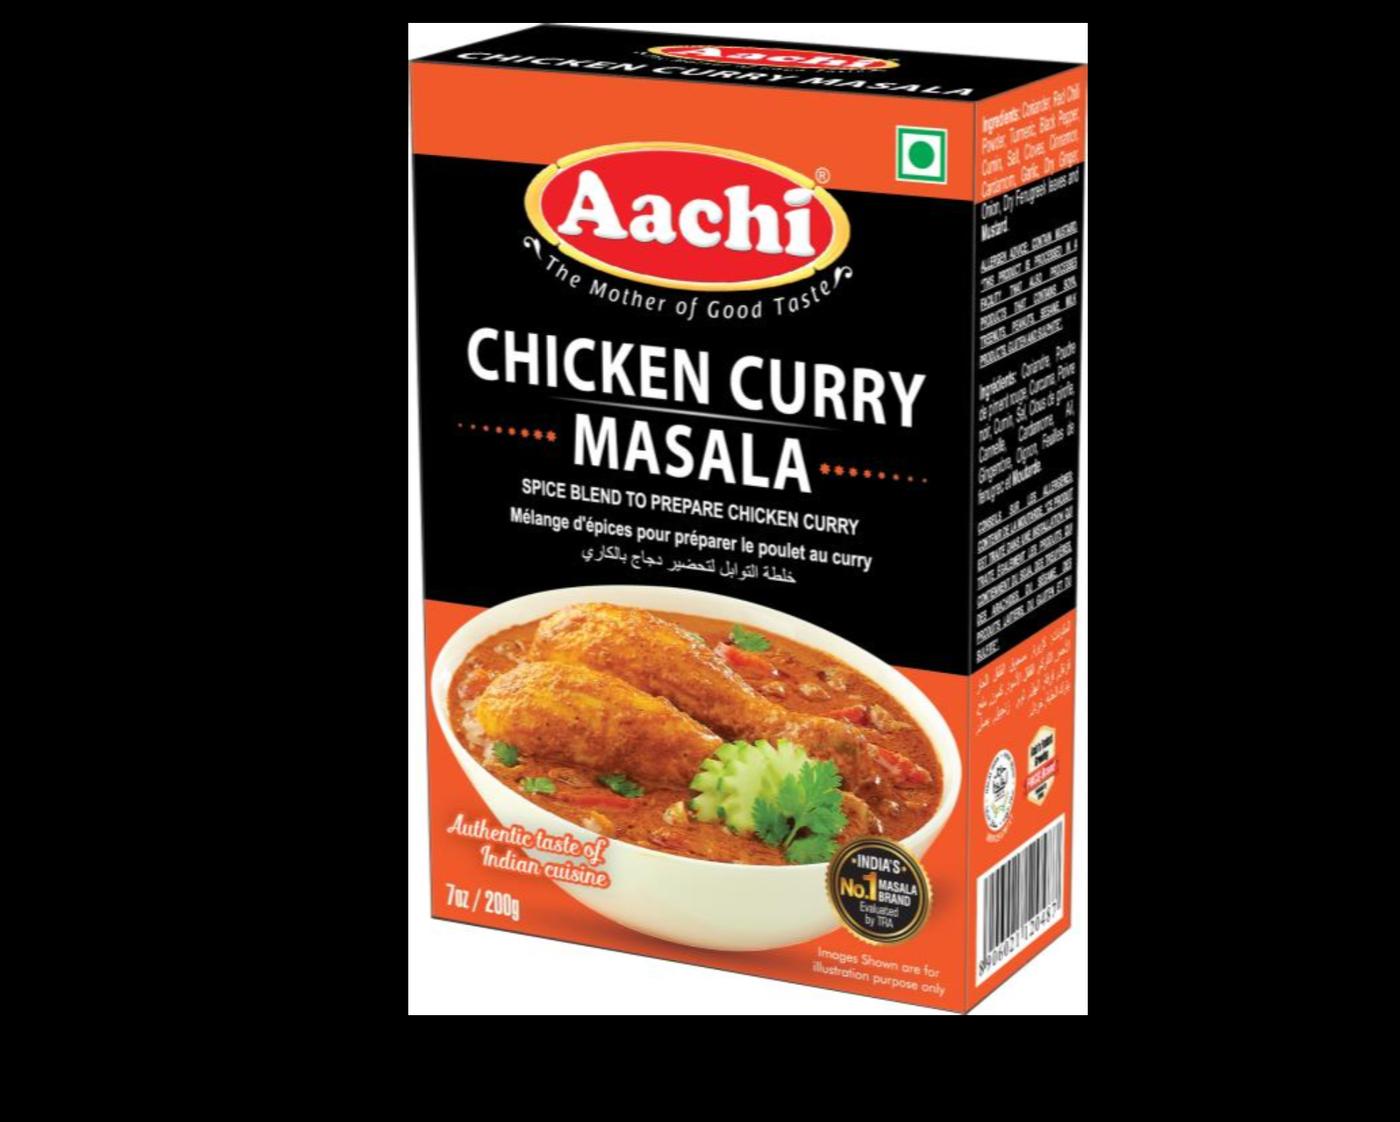 Aachi Chicken Curry Masala